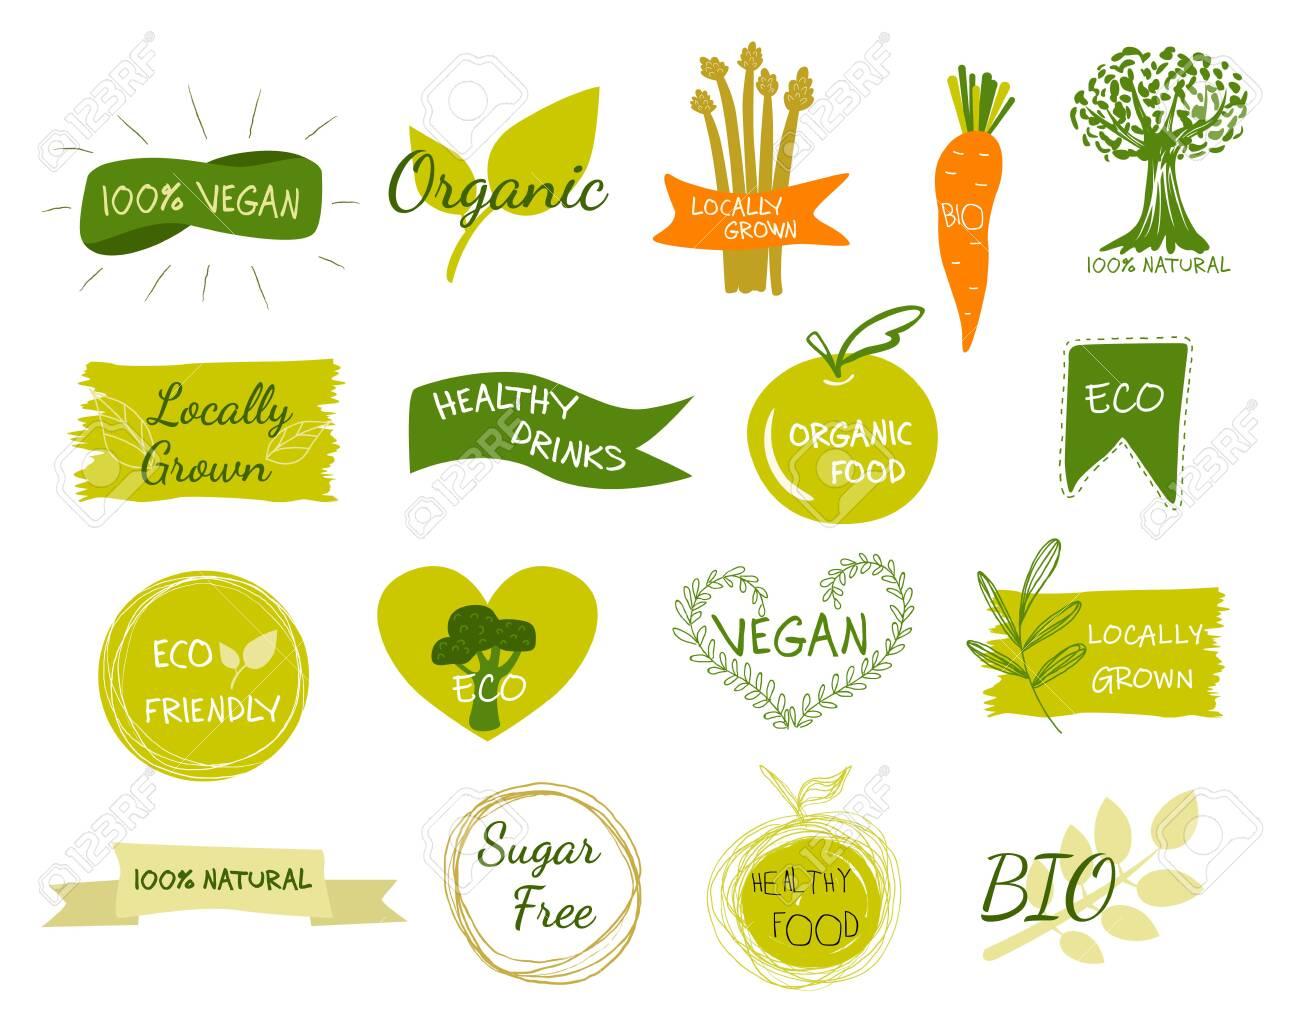 Bio, Ecology, Organic logos and icons, labels, tags. Hand drawn bio healthy food badges, set of raw, vegan, healthy food signs, organic and elements set. - 129712715